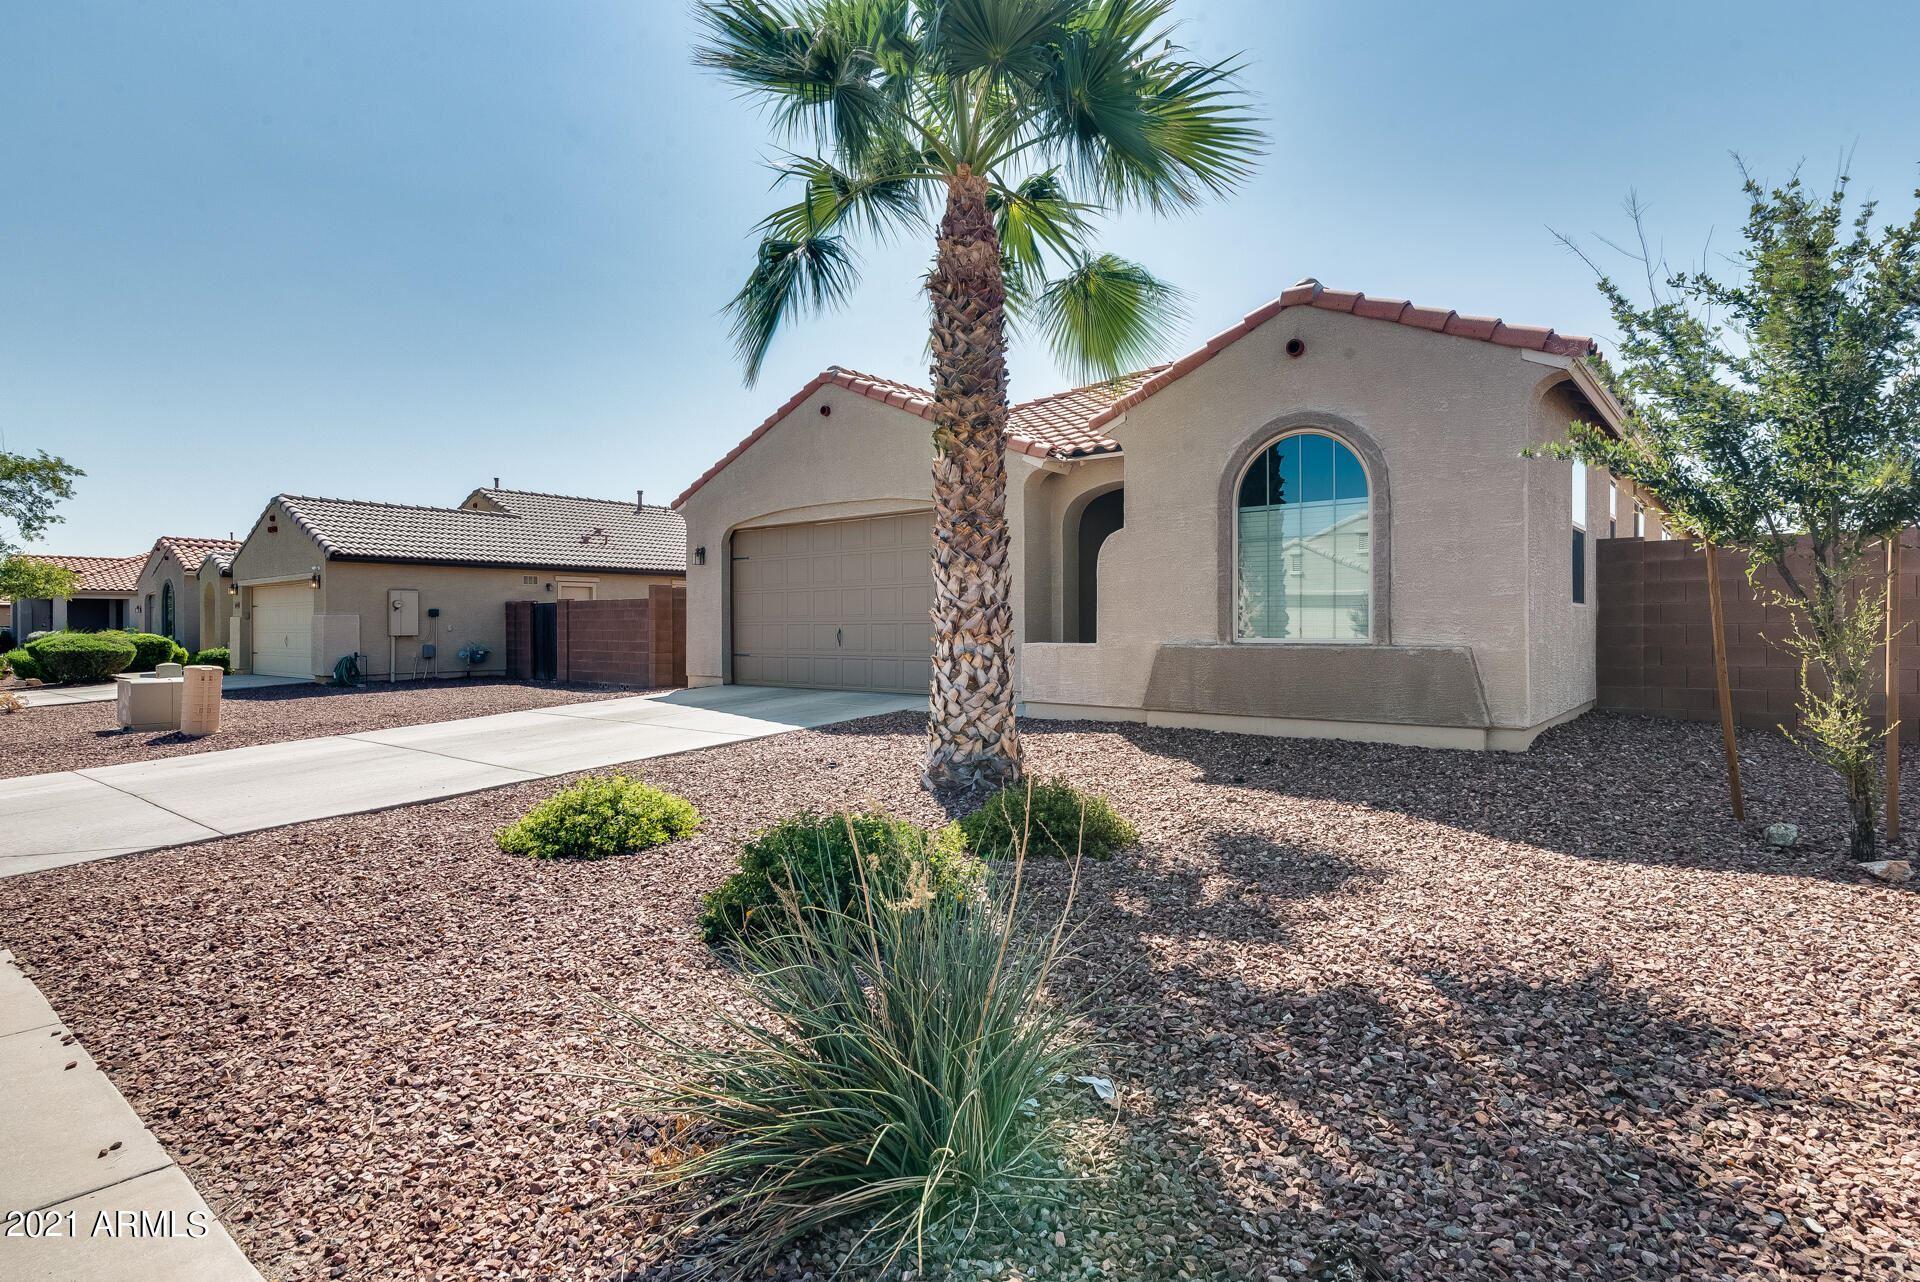 Photo of 18647 W VOGEL Avenue, Goodyear, AZ 85338 (MLS # 6294937)